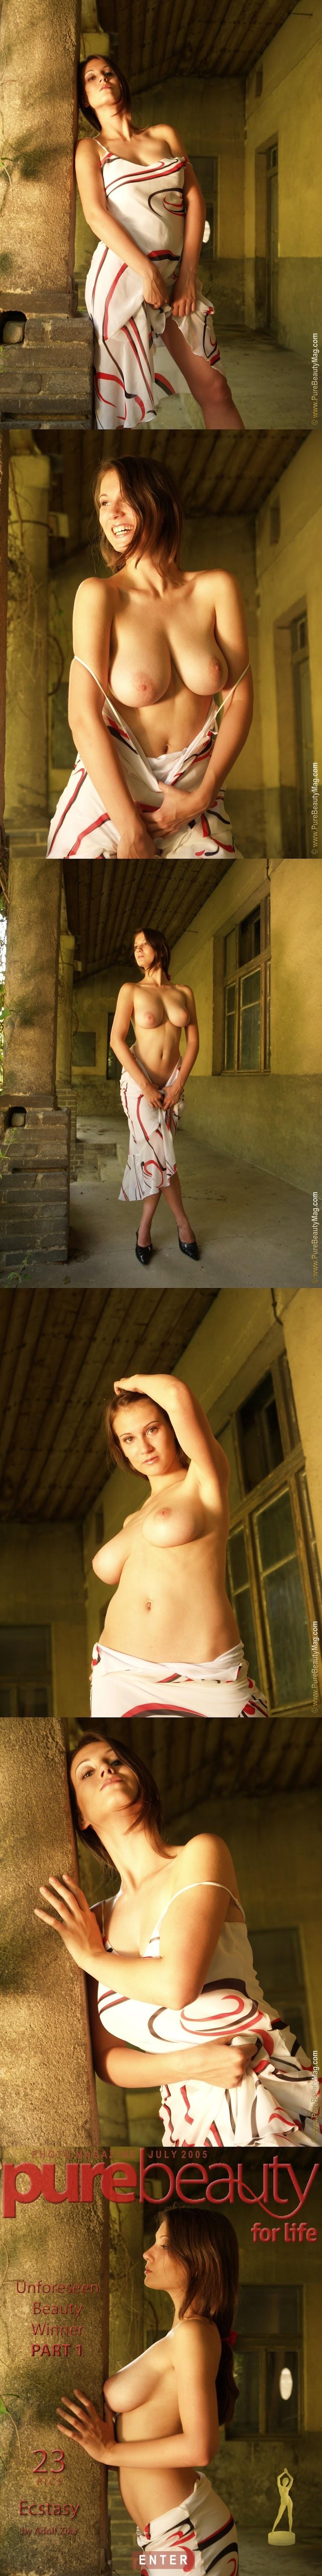 PureBeautyMag PBM  - 2005-07-21 -  s94355 - Michaela B - Ecstasy - 2560px sexy girls image jav